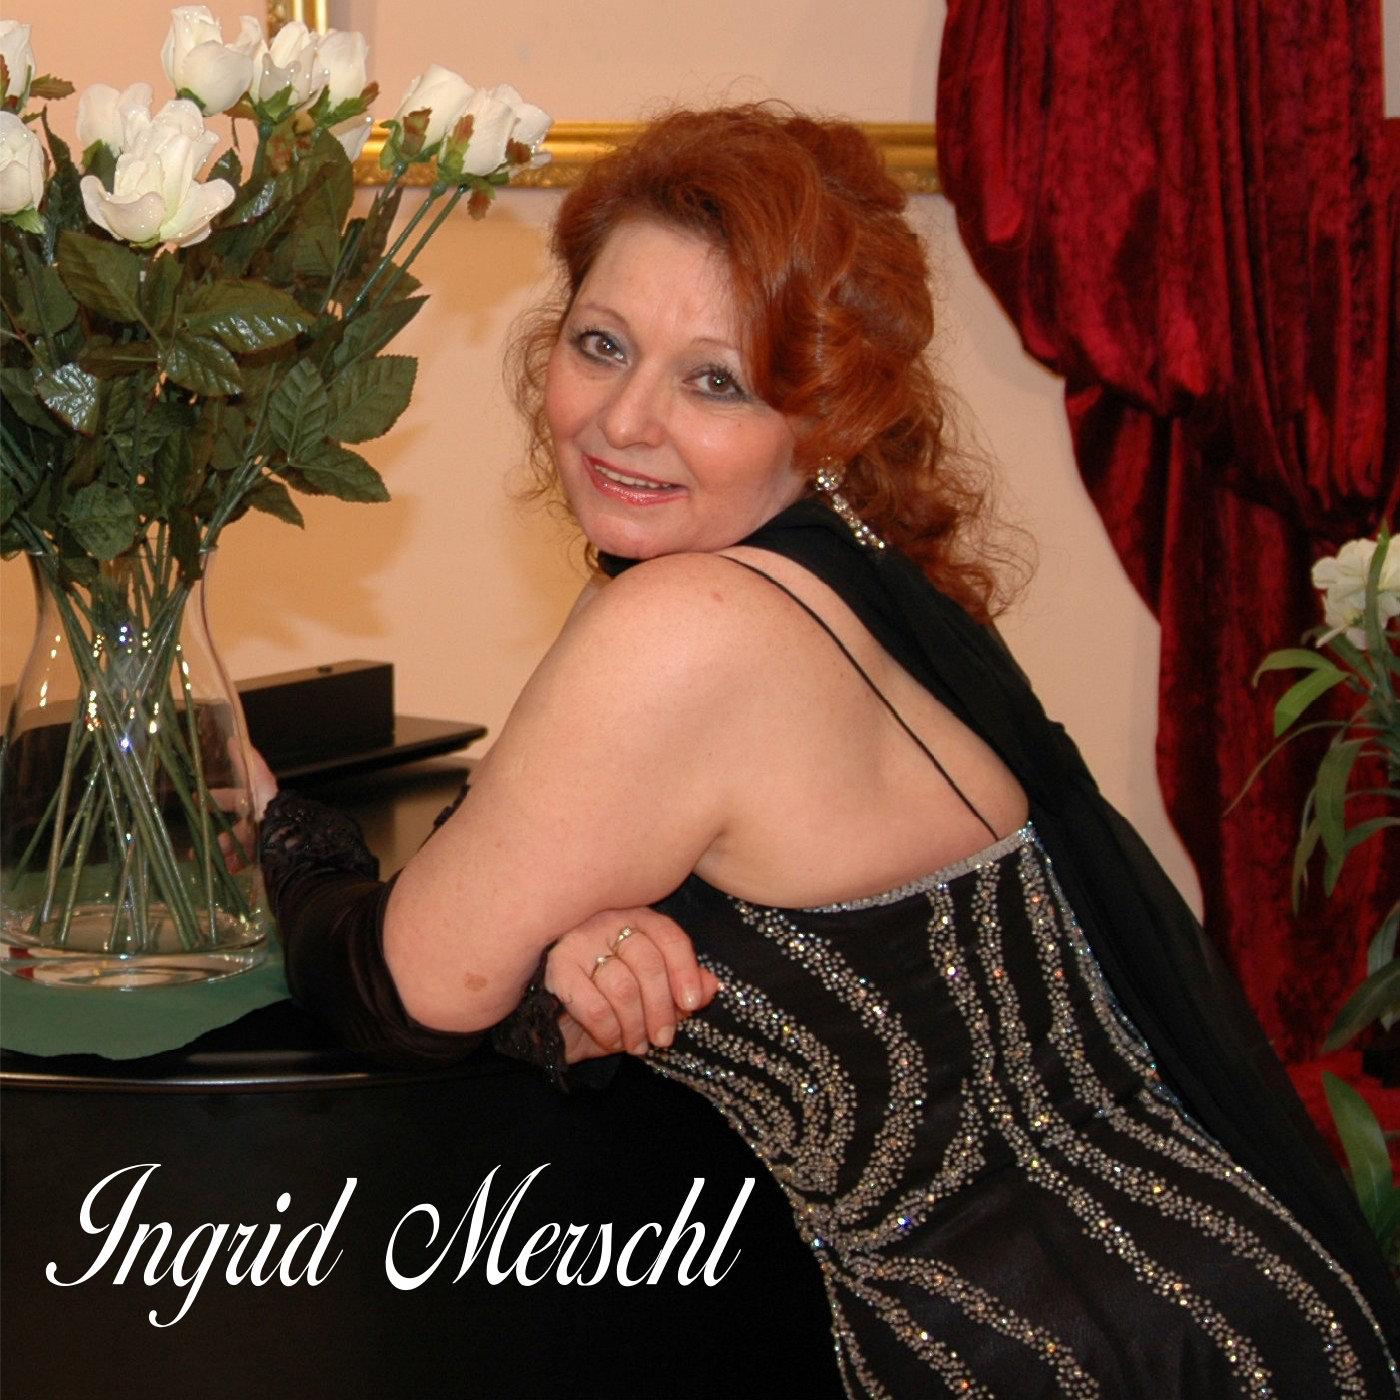 Ingrid Merschl